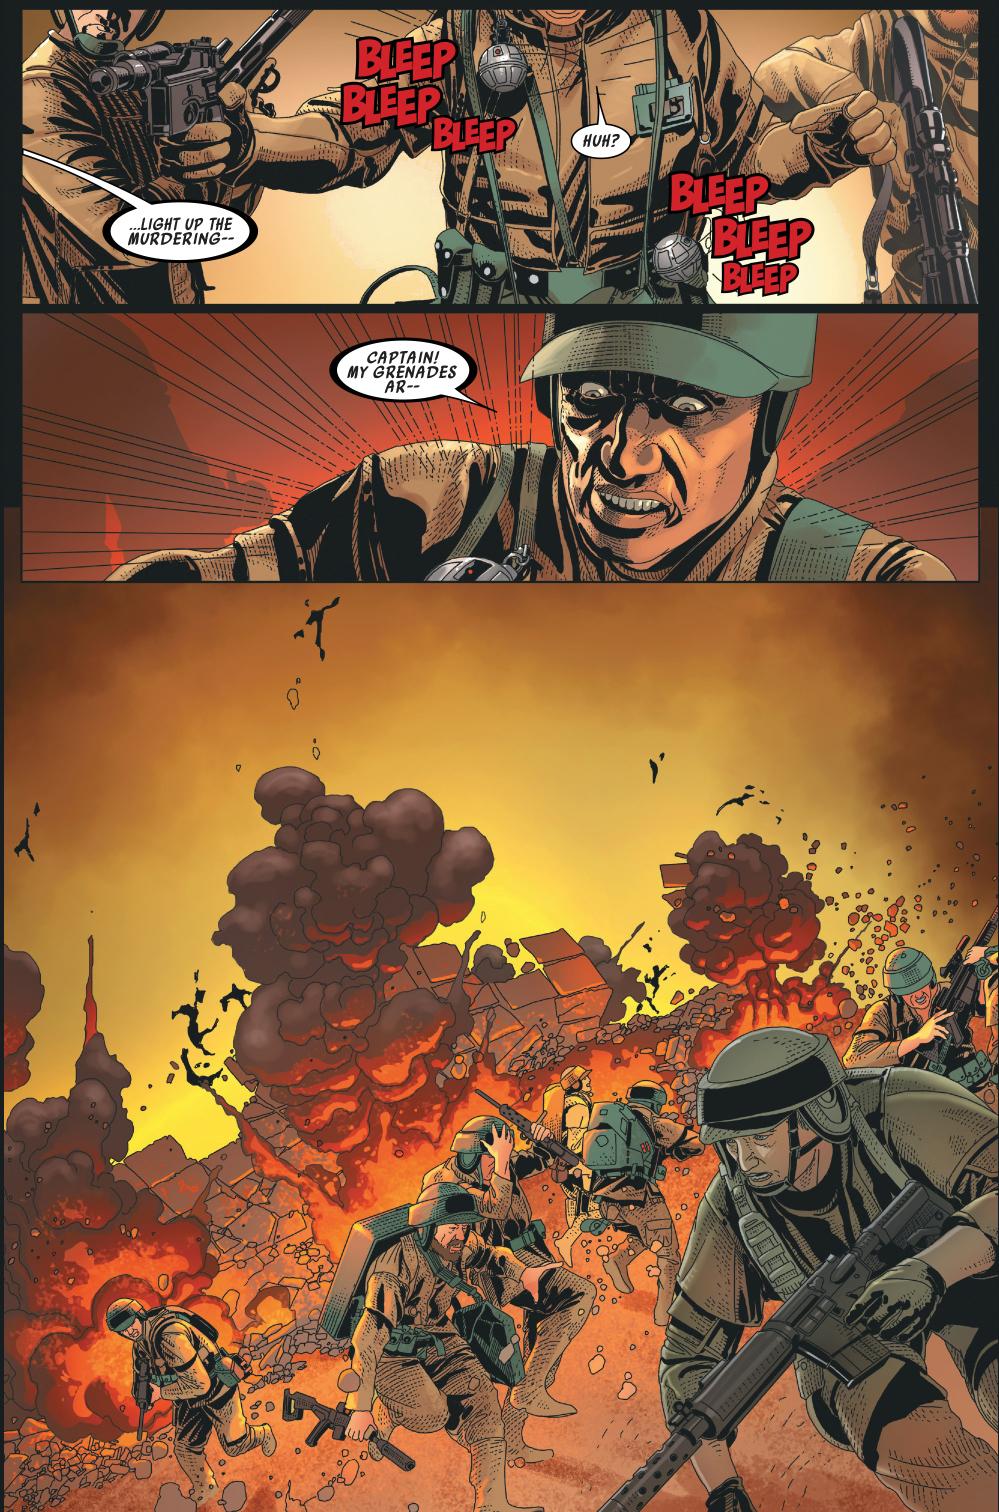 The four rebels enter sandman 1 - 3 part 4